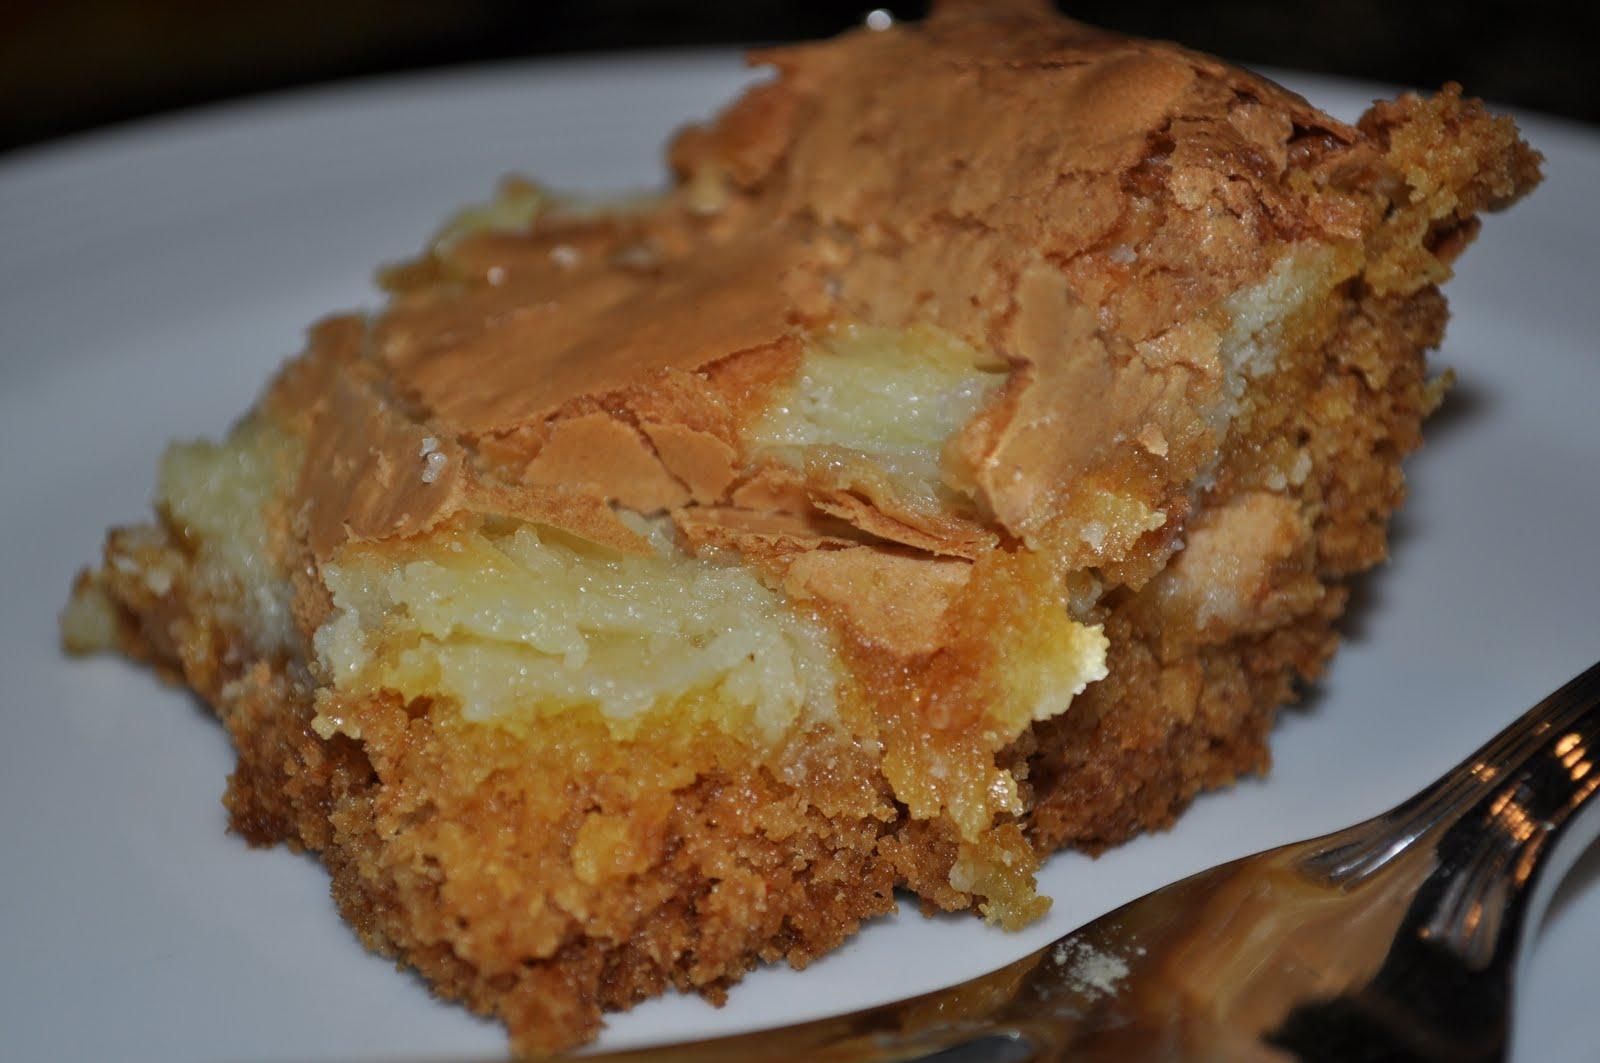 Little Bit of Everything: Ooey Gooey Butter Cake